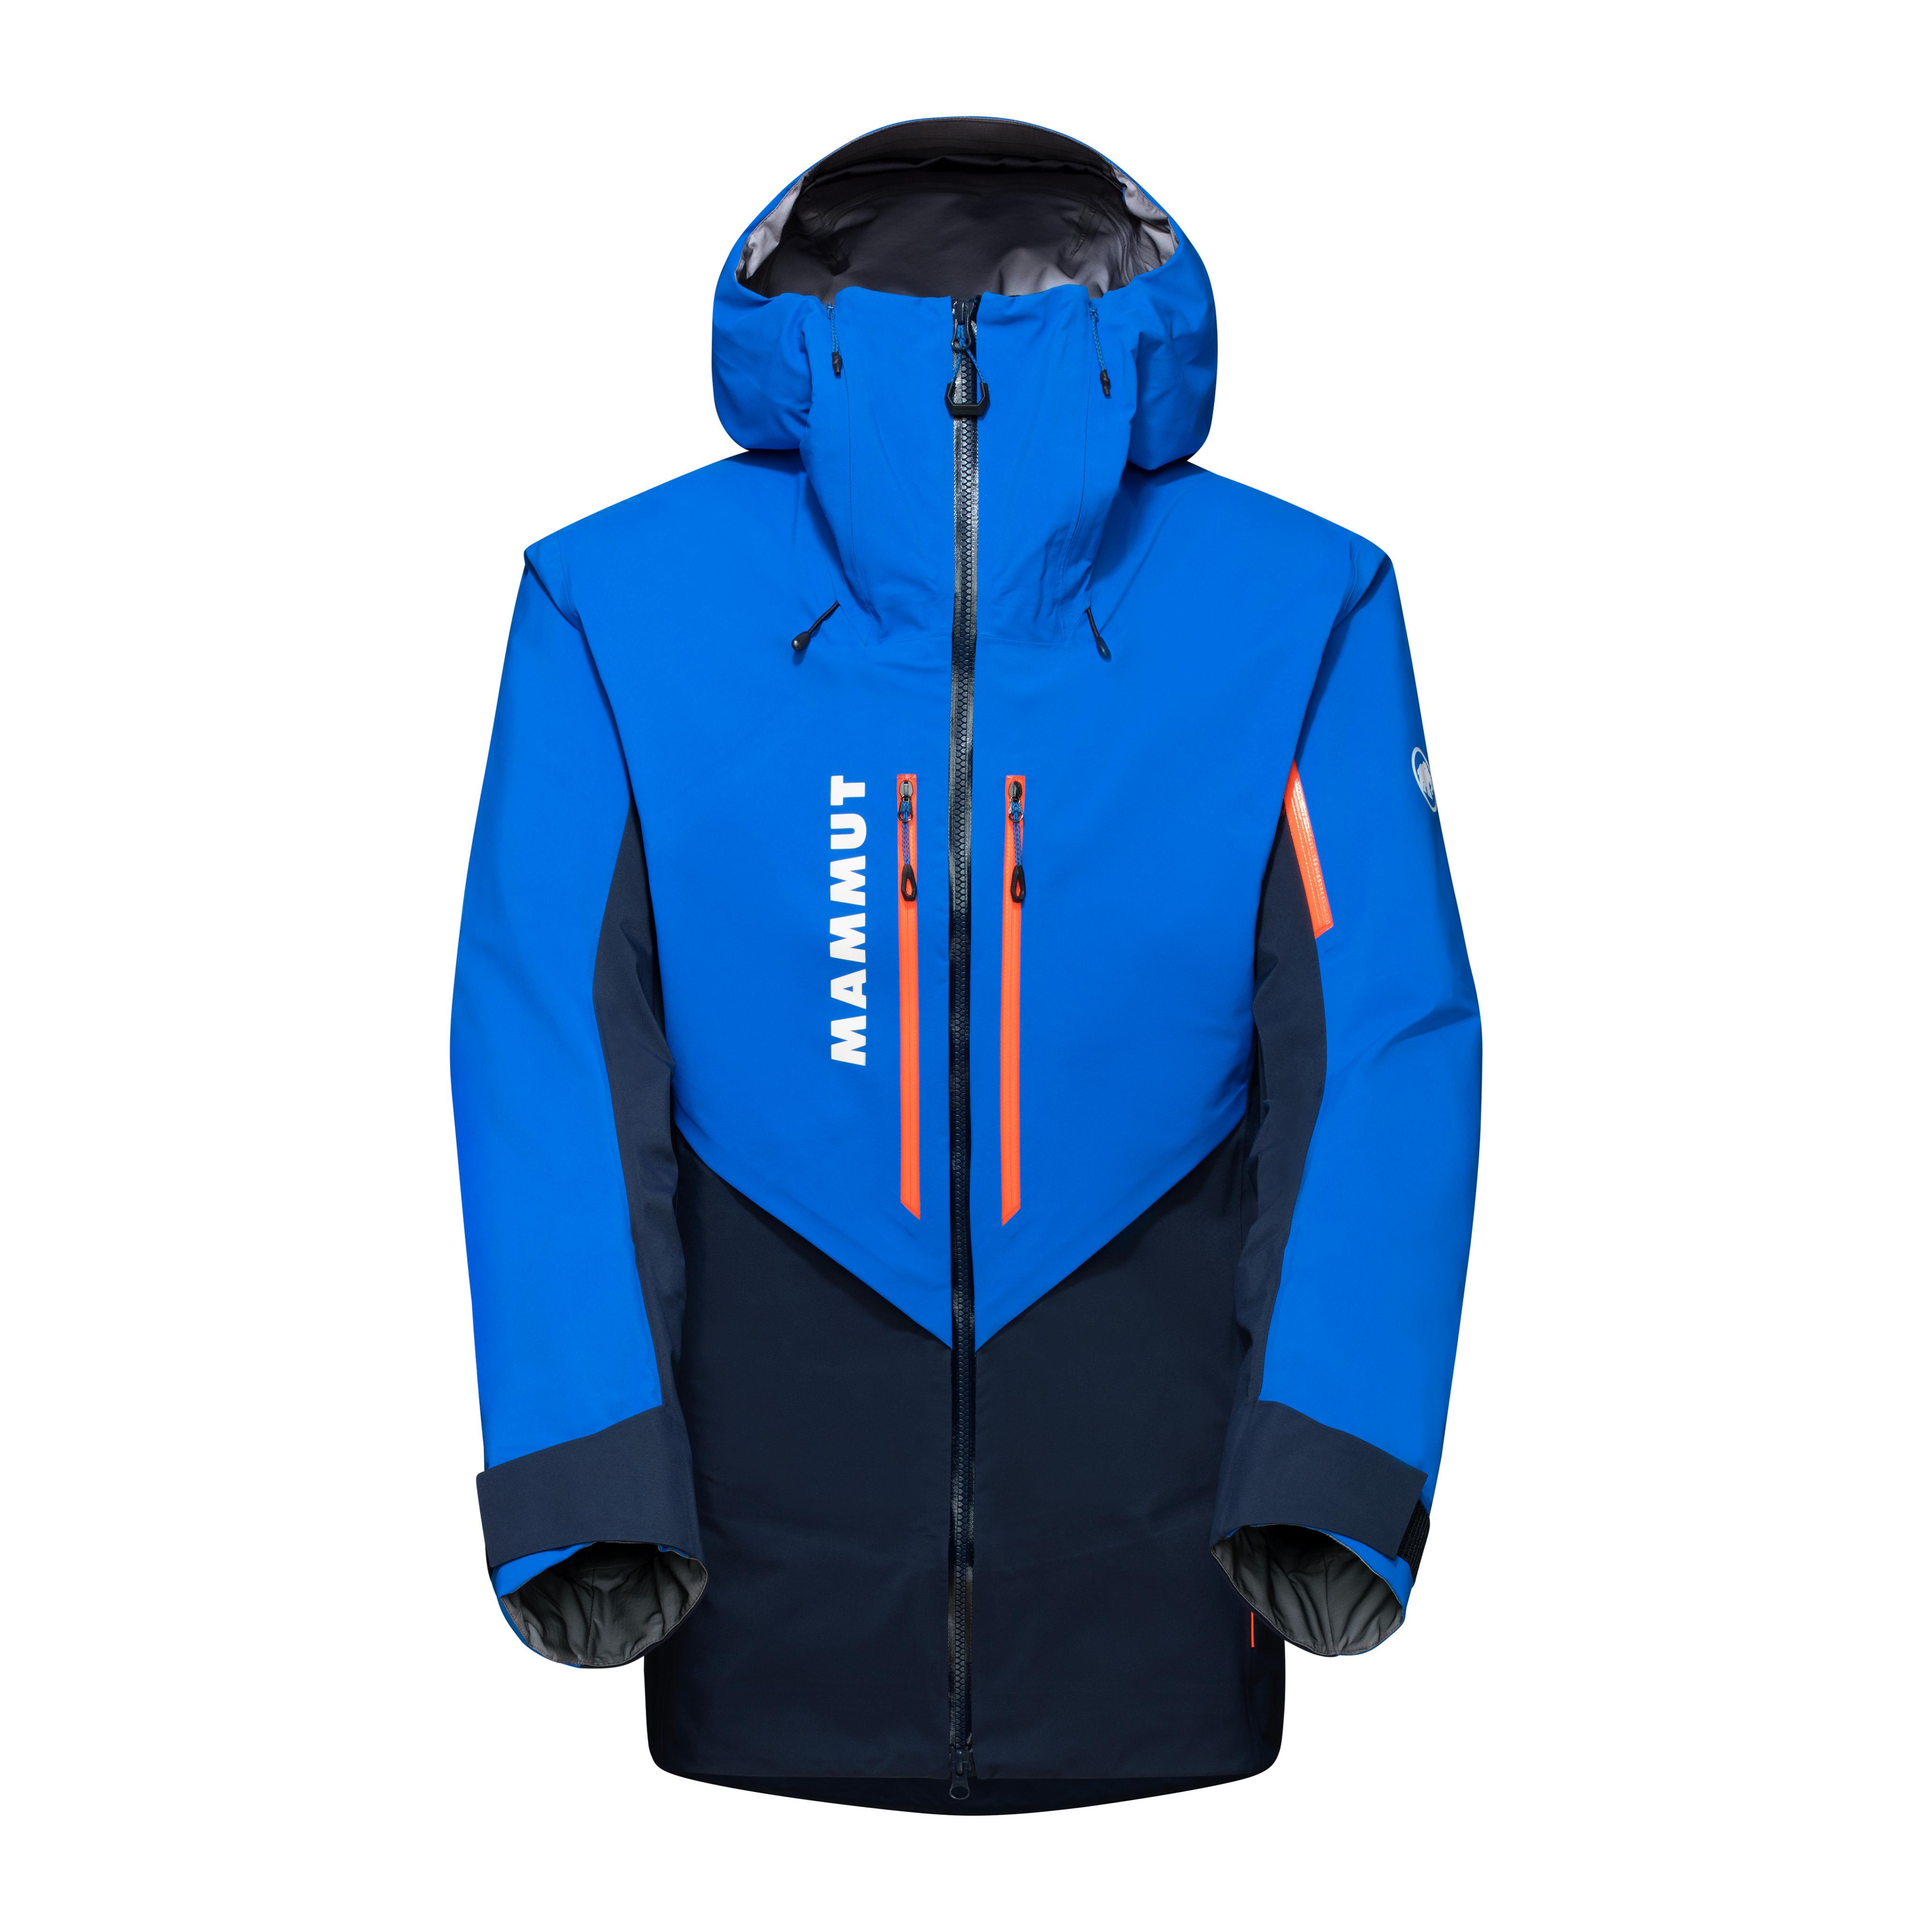 La Liste HS Hooded Jacket Men - marine-ice, S thumbnail